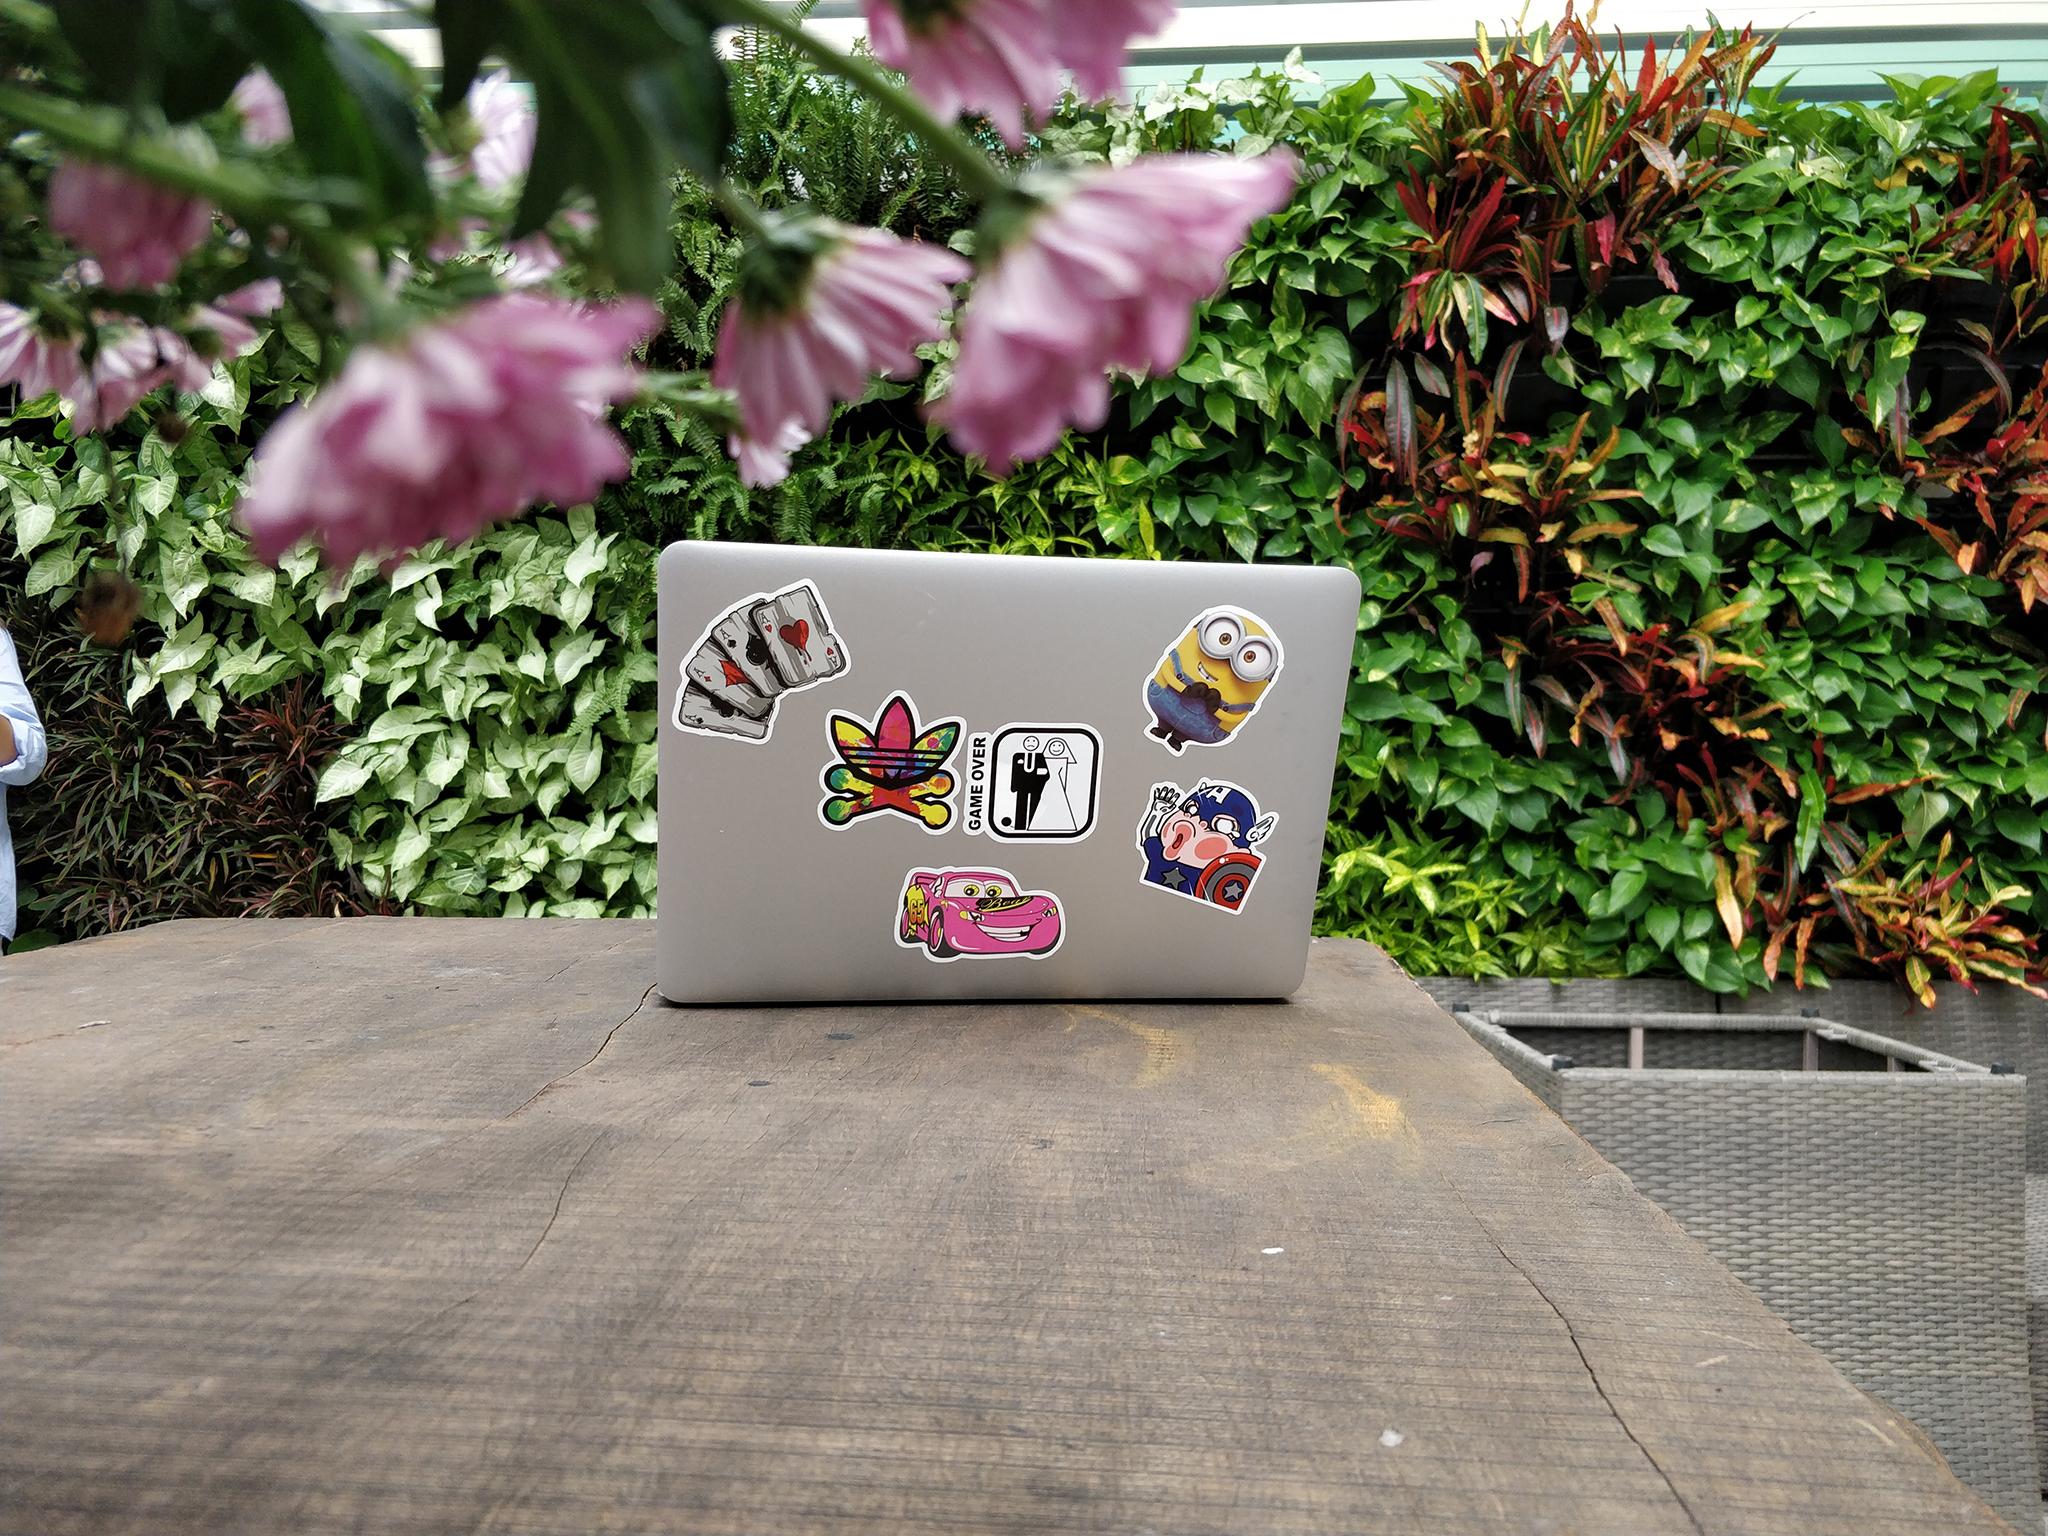 OnePlus5-zoom-2a-tinhte.jpg